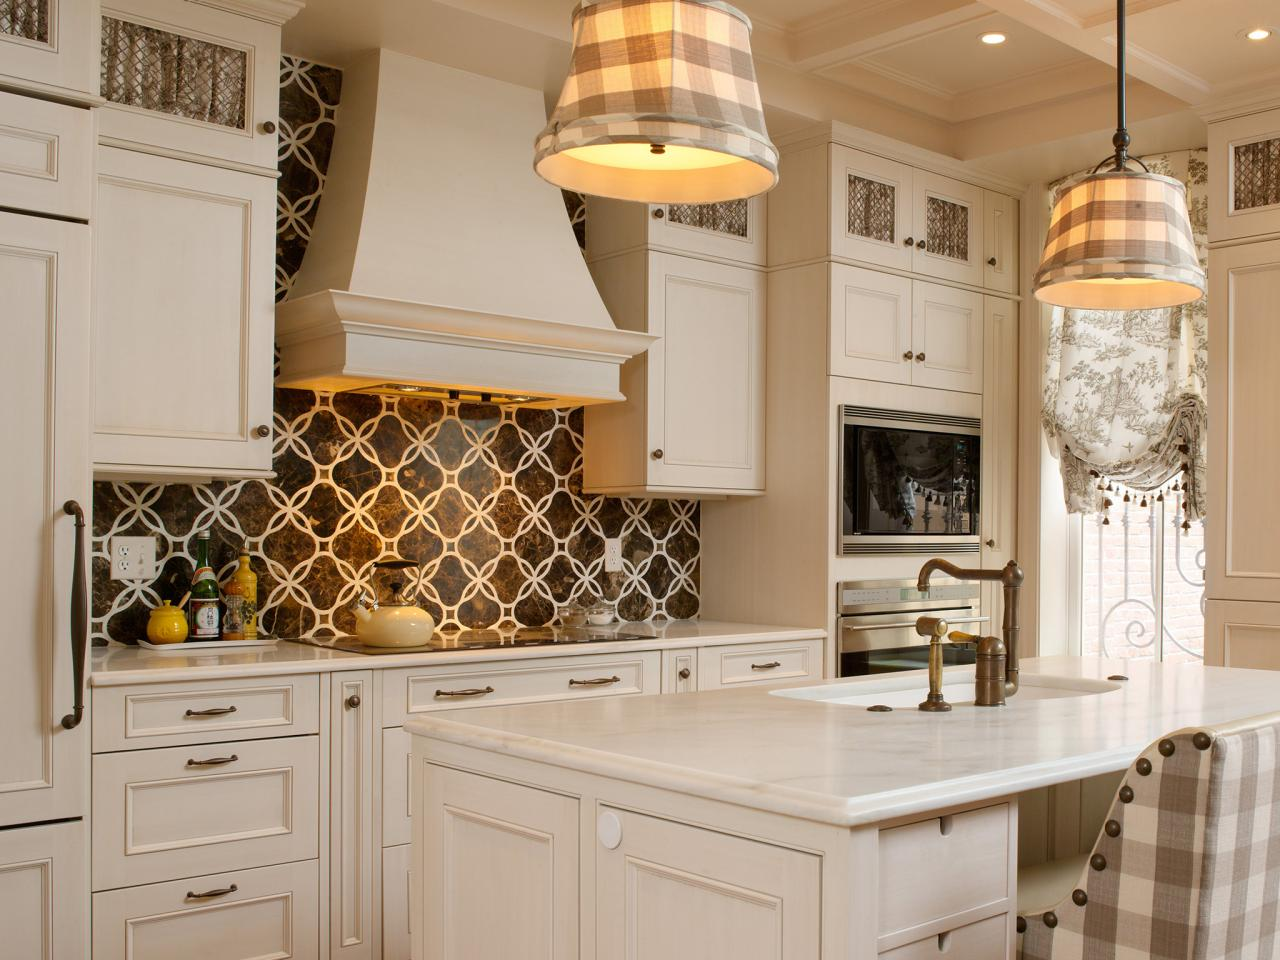 DP Shazalynn Cavin Winfrey Kitchen Backsplash Design Ideas s4x3.jpg.rend .hgtvcom.1280.960